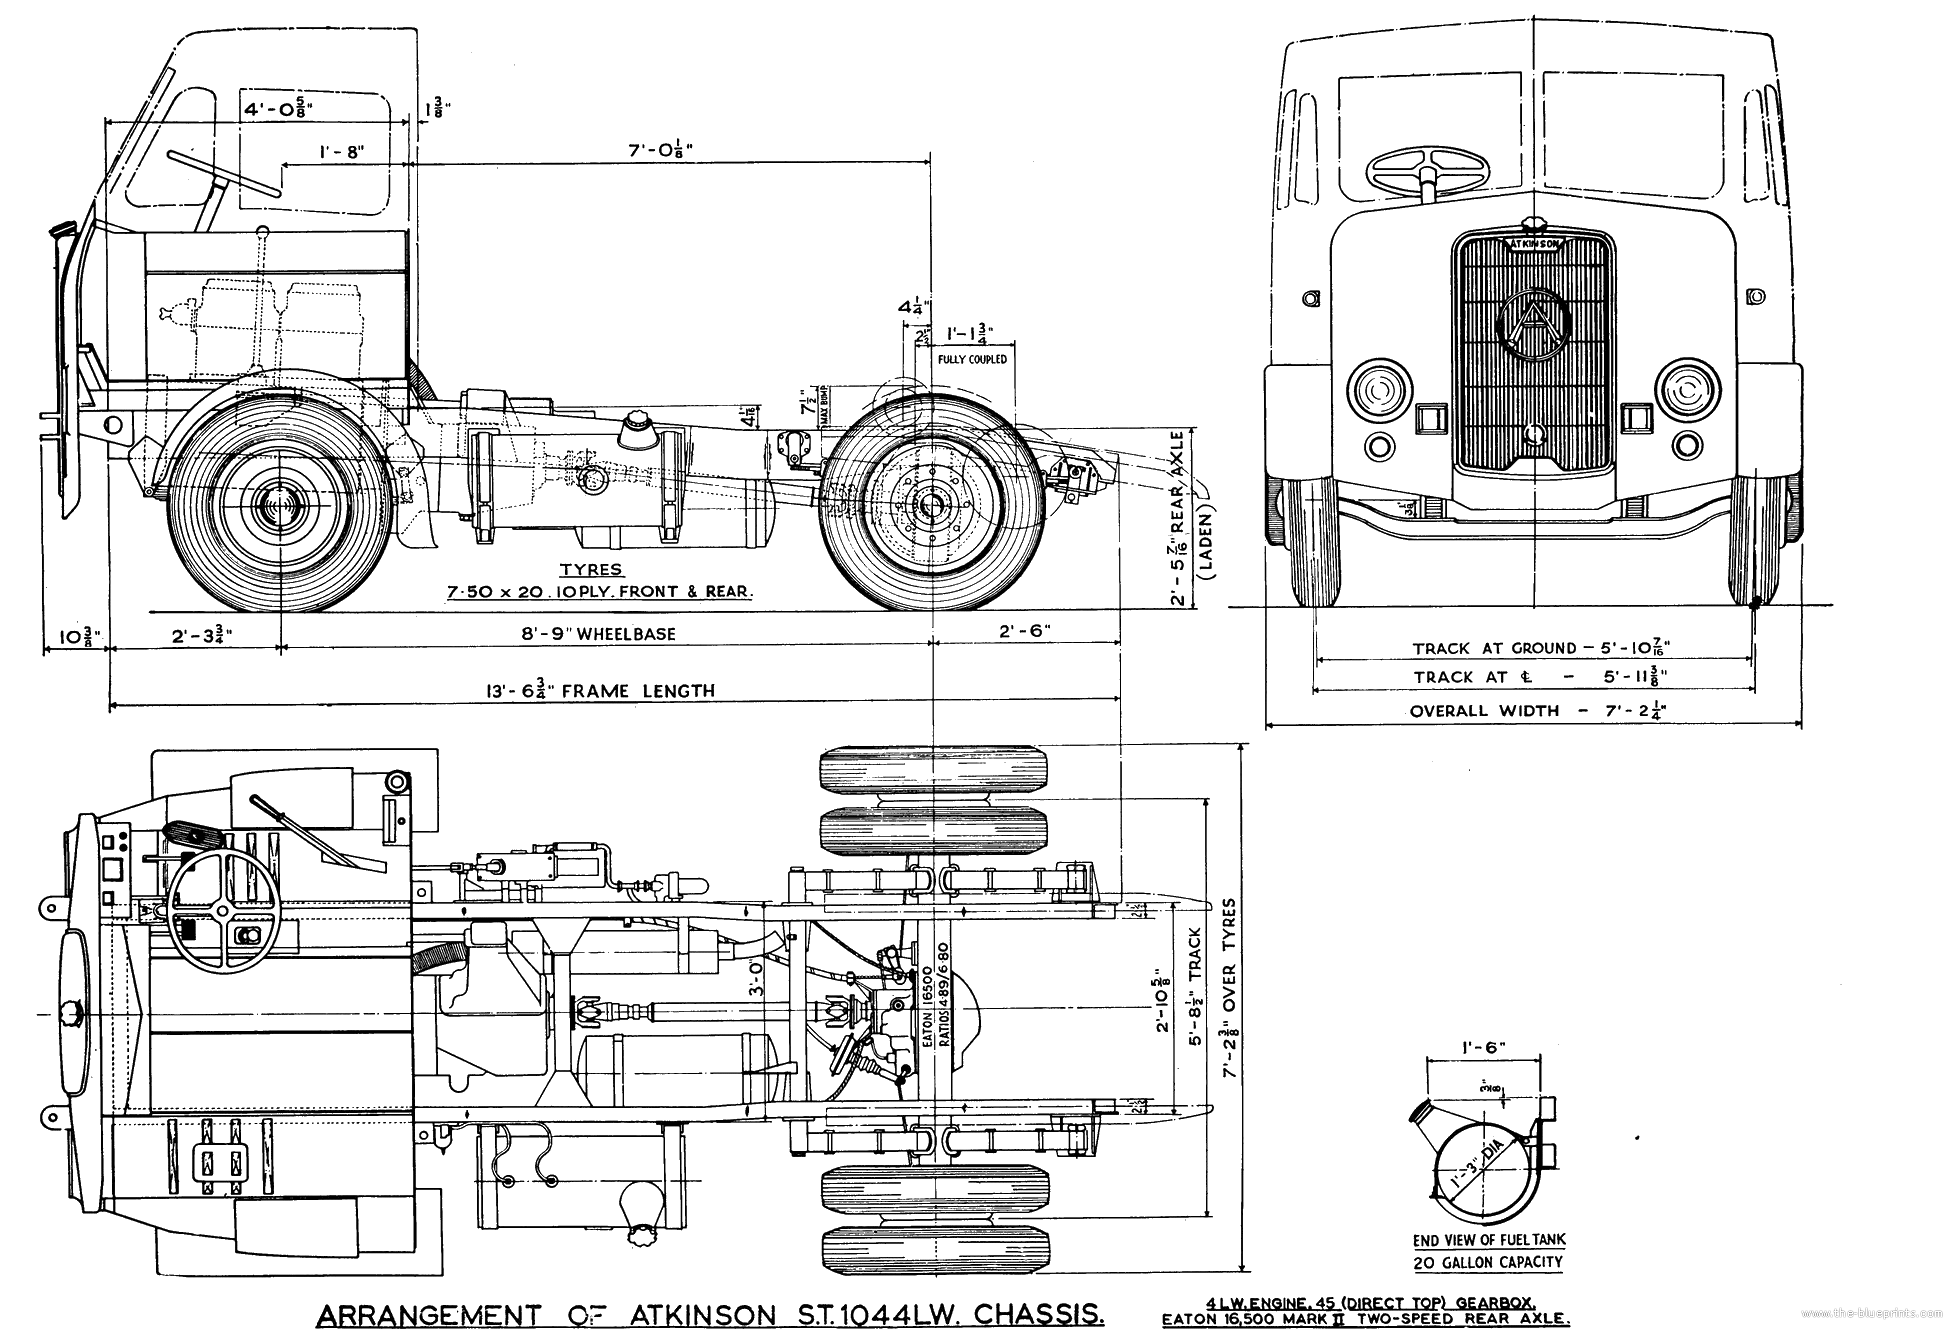 blueprints trucks trucks atkinson stlw tractor cab